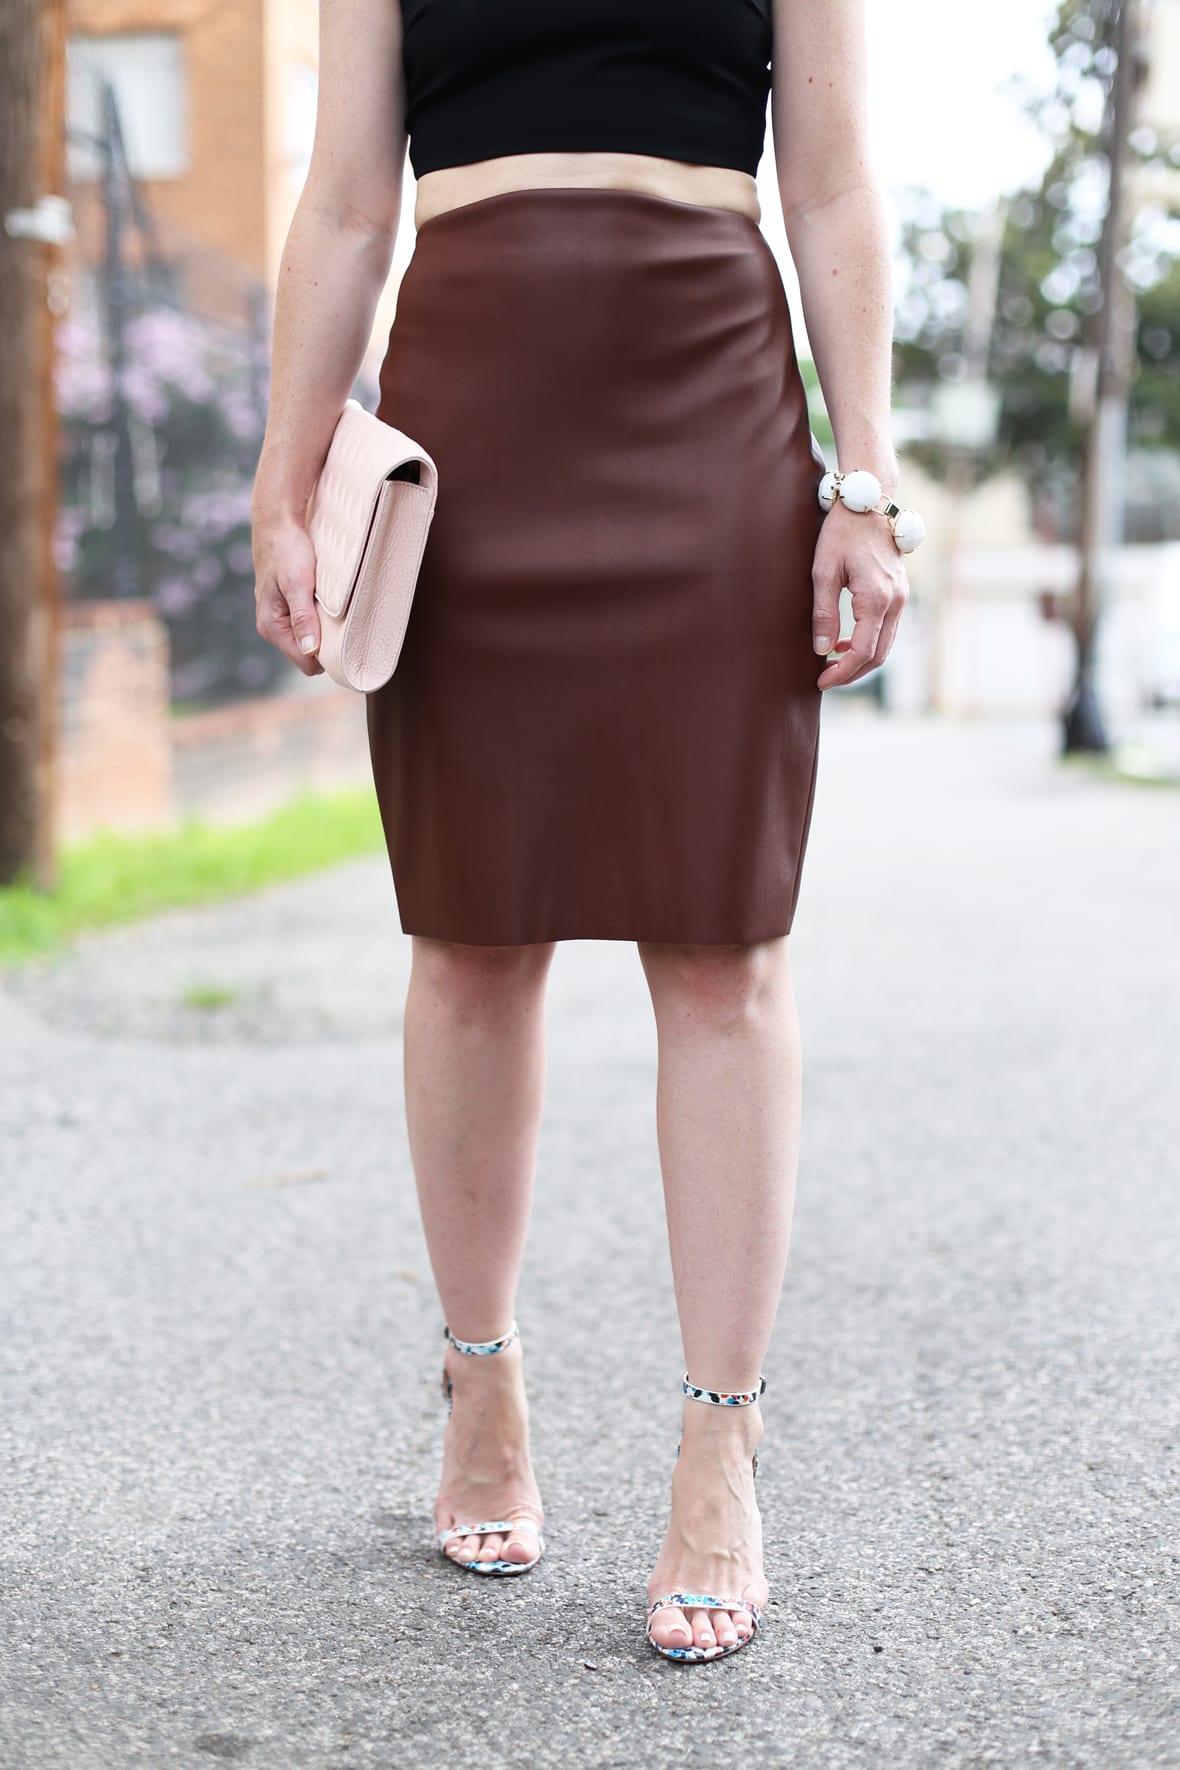 Black Crop Top and Faux Leather Pencil Skirt on Poor Little It Girl - via @poorlilitgirl